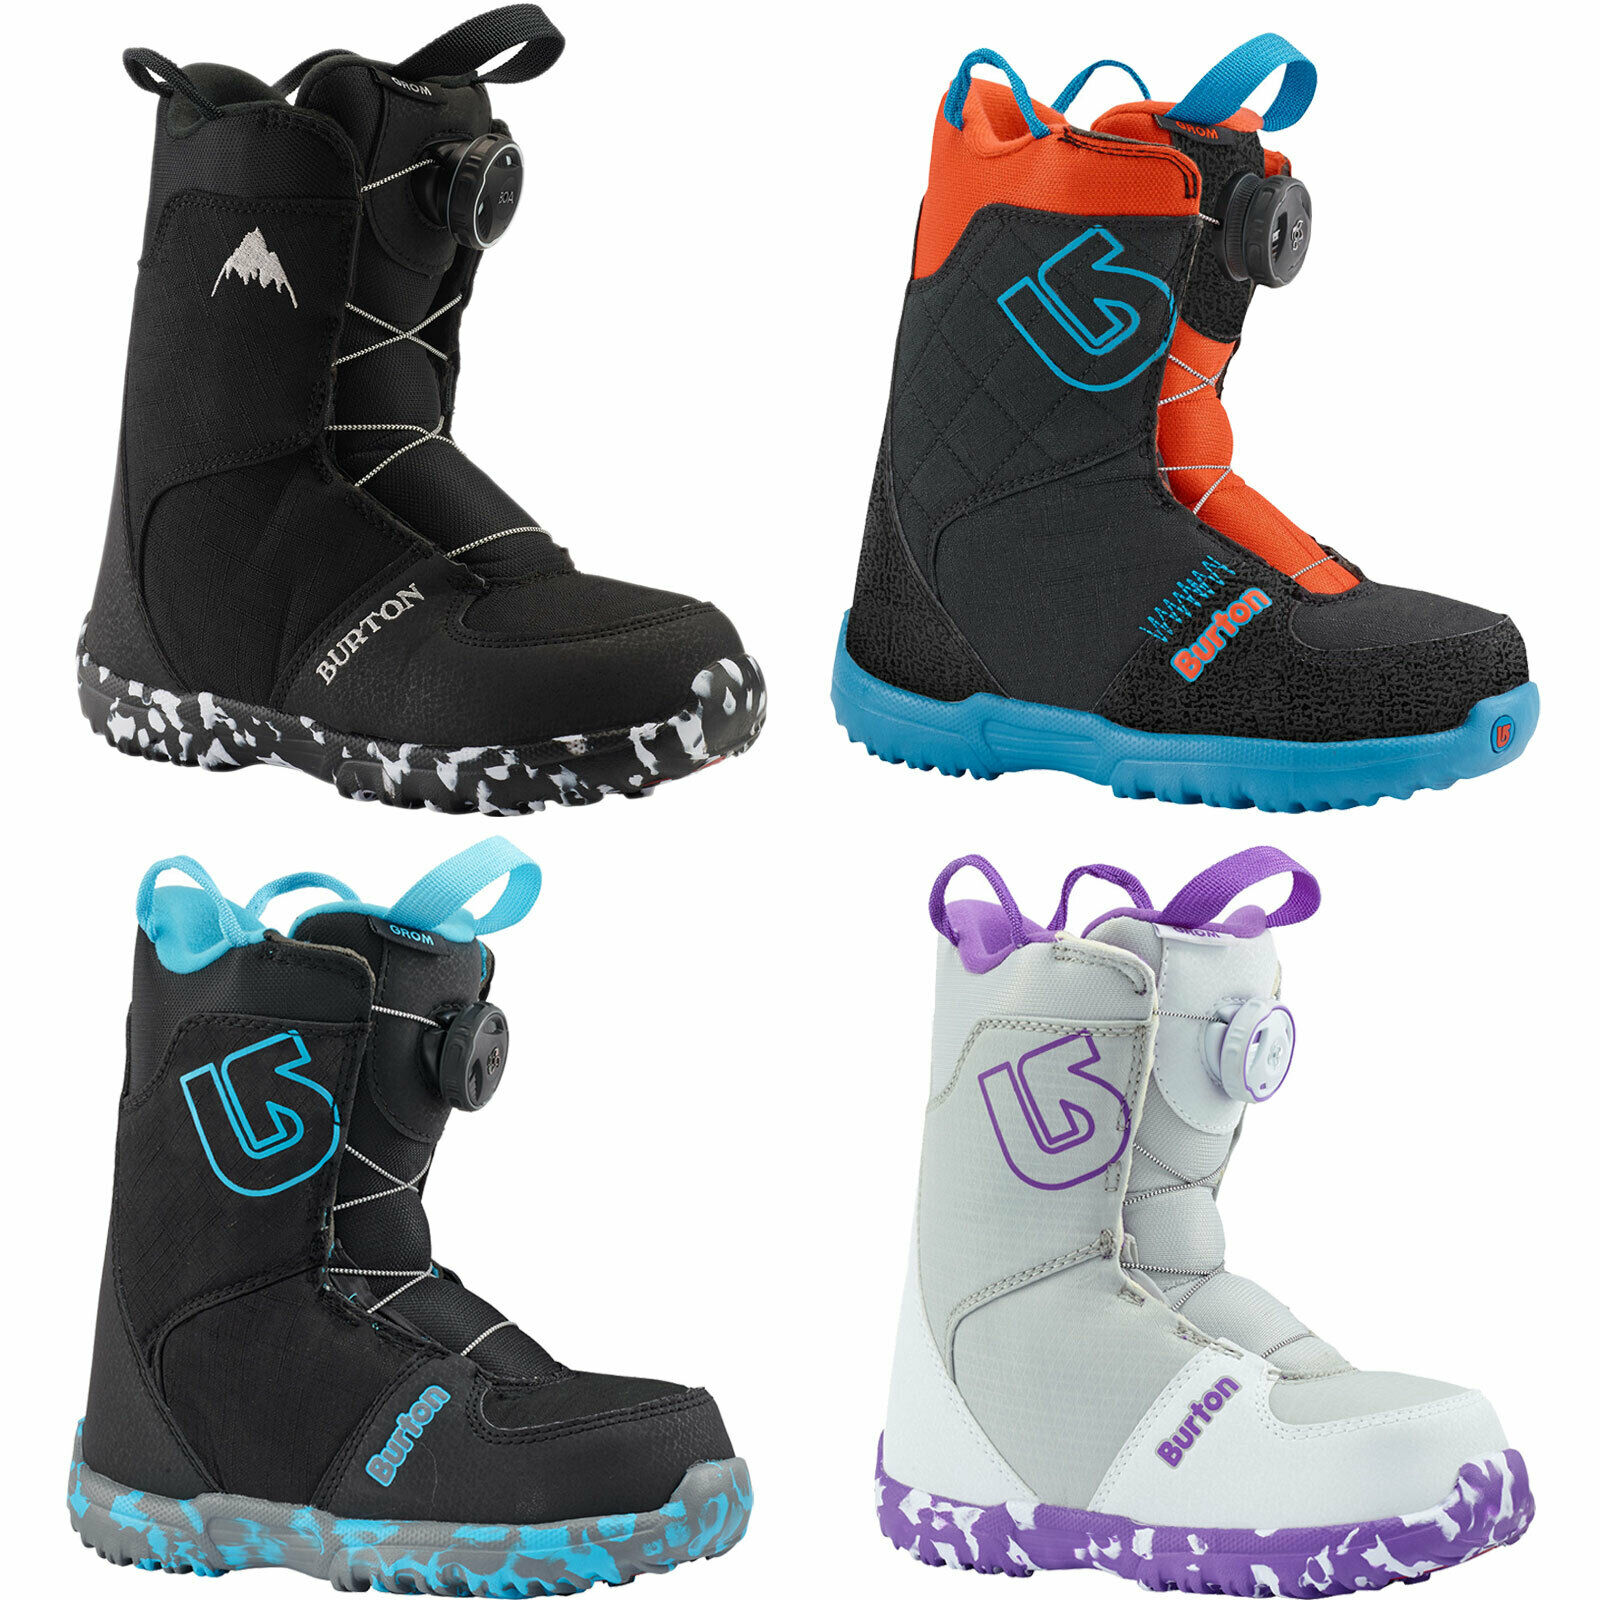 Burton Grom Boa Kinder-Snowboardschuhe Soft  Boots  ldren´S Snowboard New  60% off